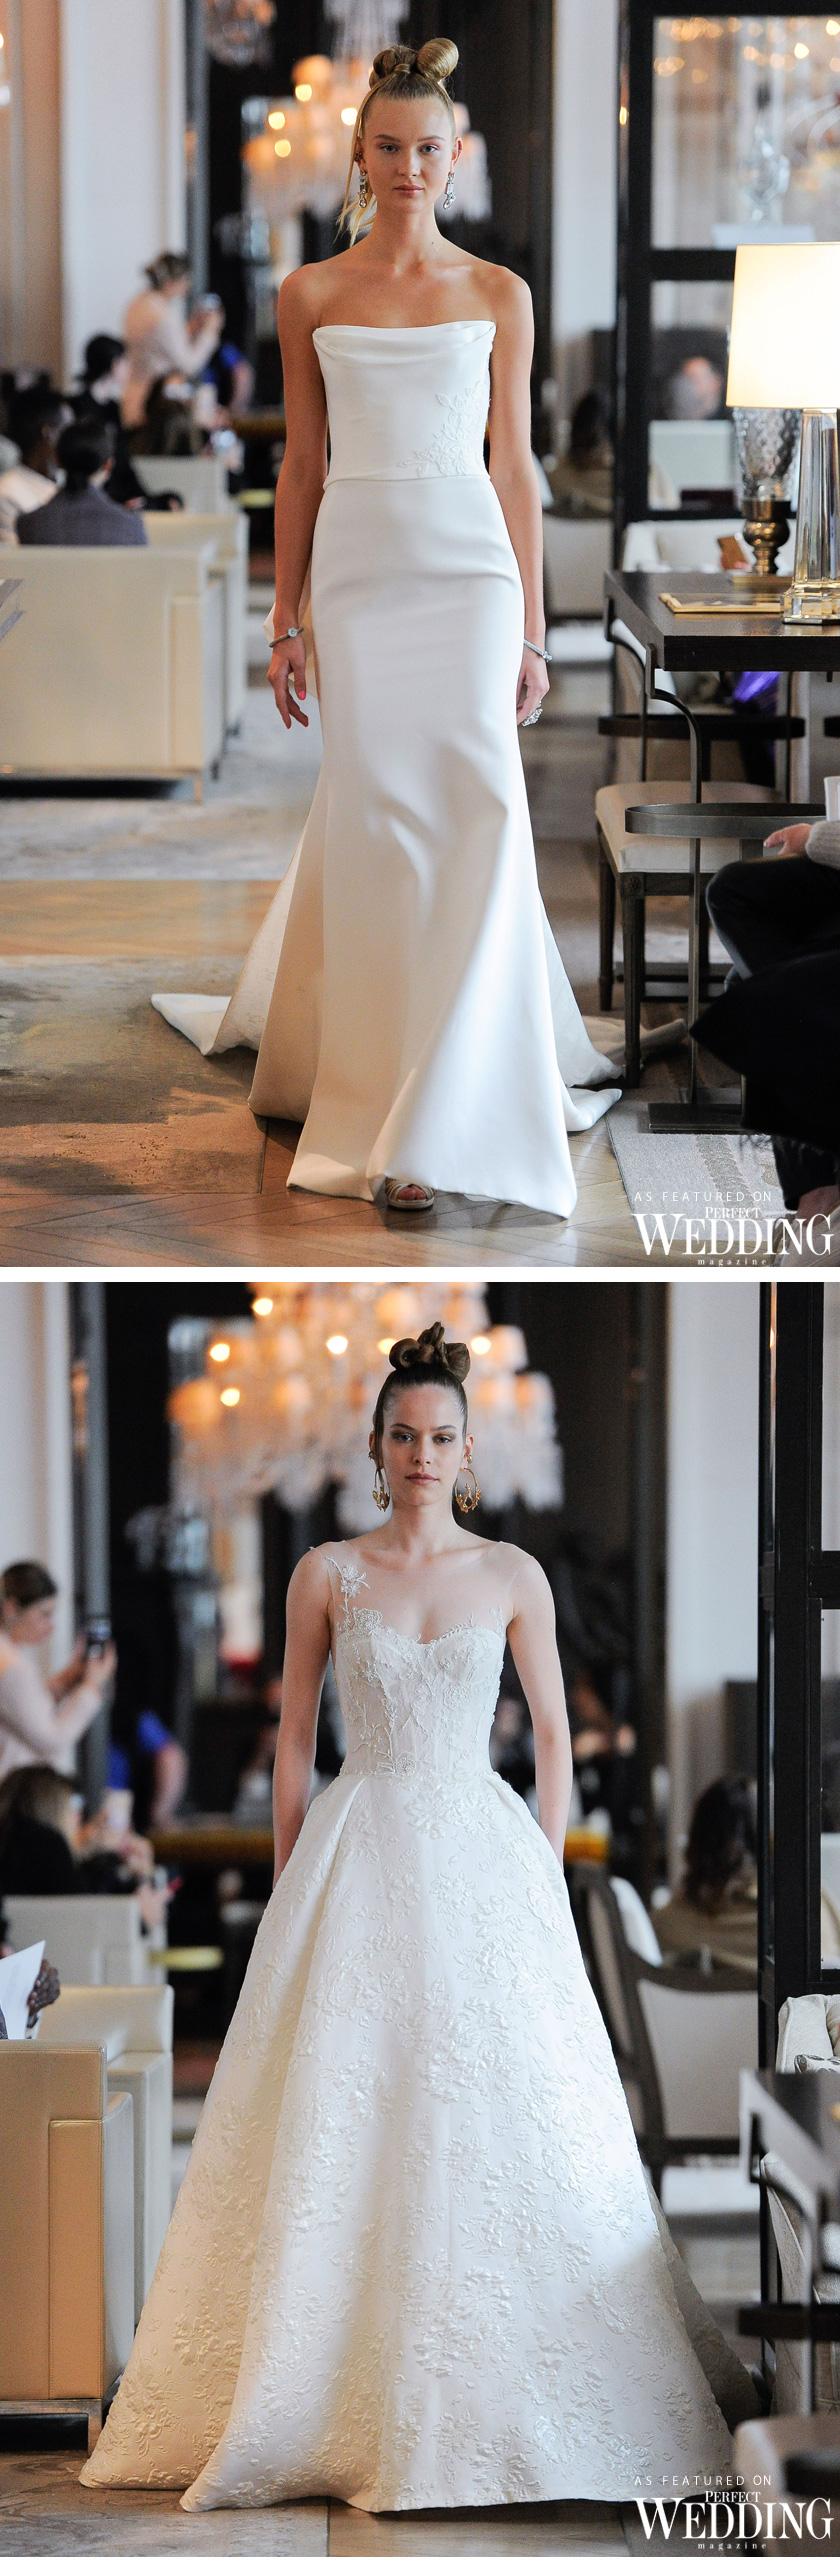 Ines Di Santo, IamInesDiSanto, NYFBridalWeek, NYBFW, Bridal Fashion Week, Weddings 2020, Spring 2020, Bridal Trends, Perfect Wedding Magazine, Perfect Wedding Blog